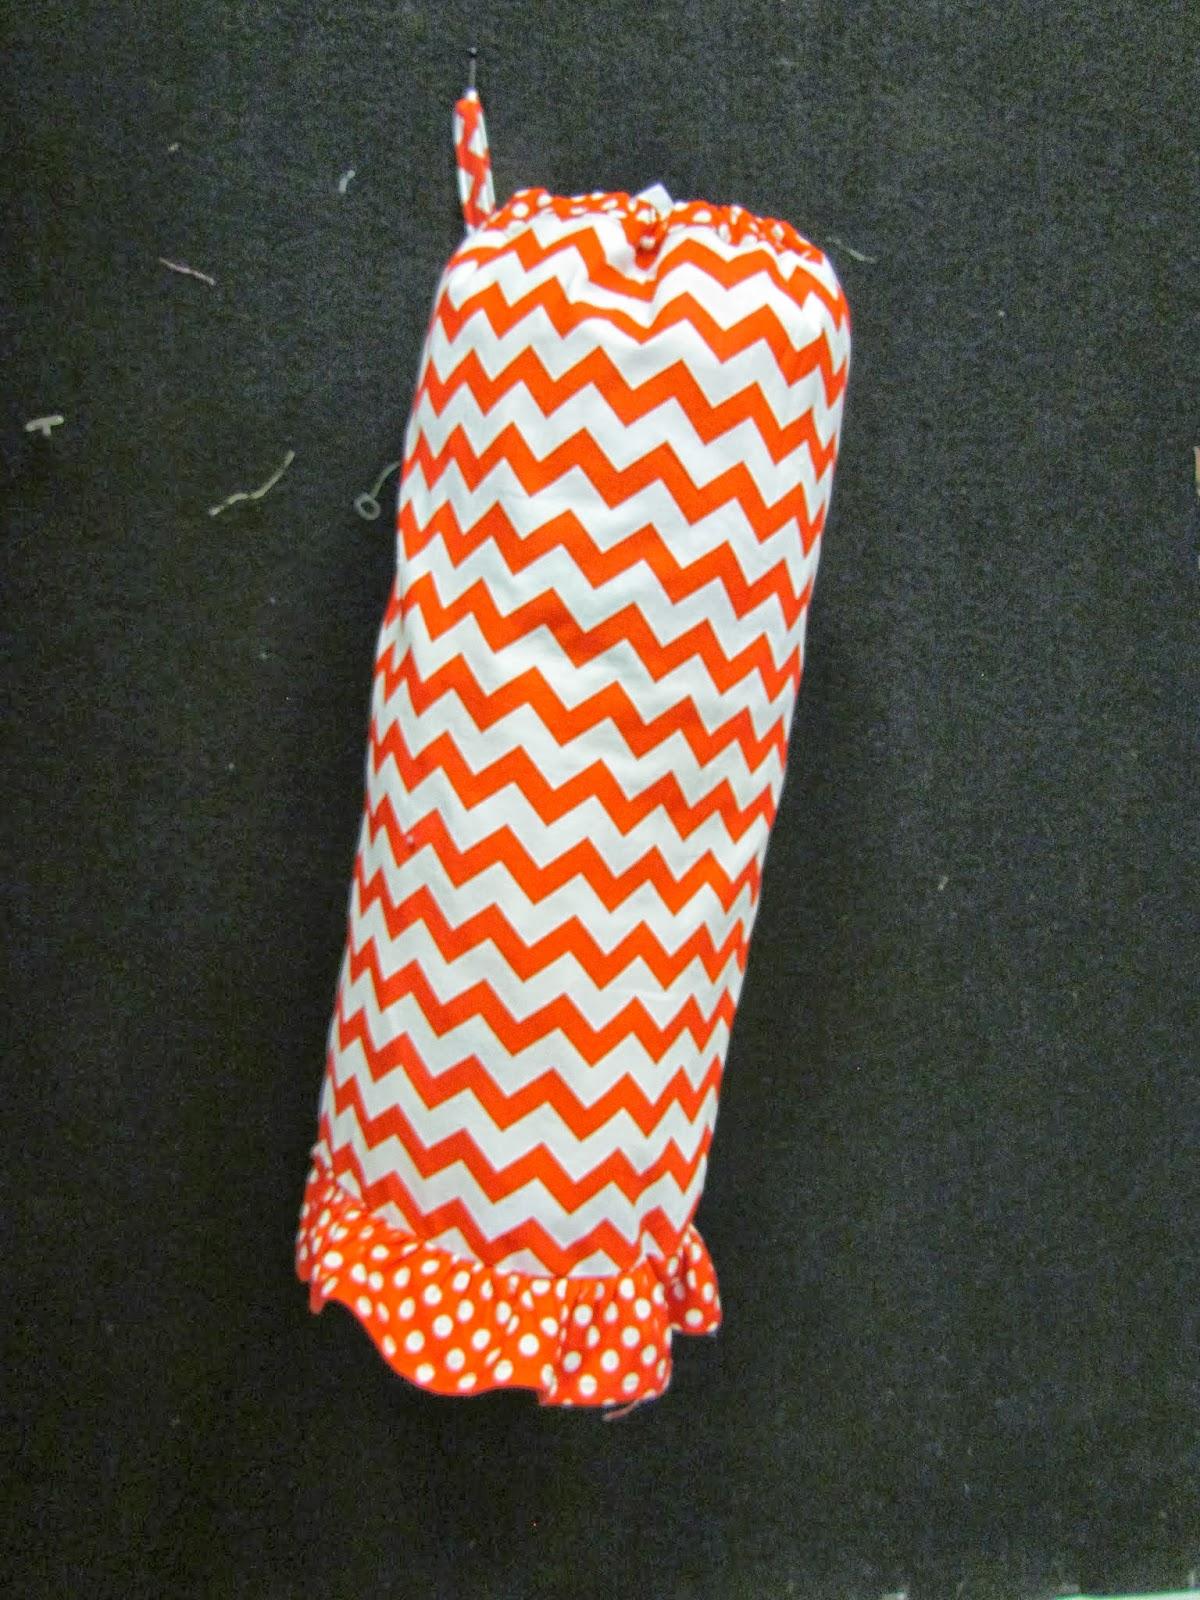 Fabric Center Utah: Janet's Plastic Bag Holder Tutorial